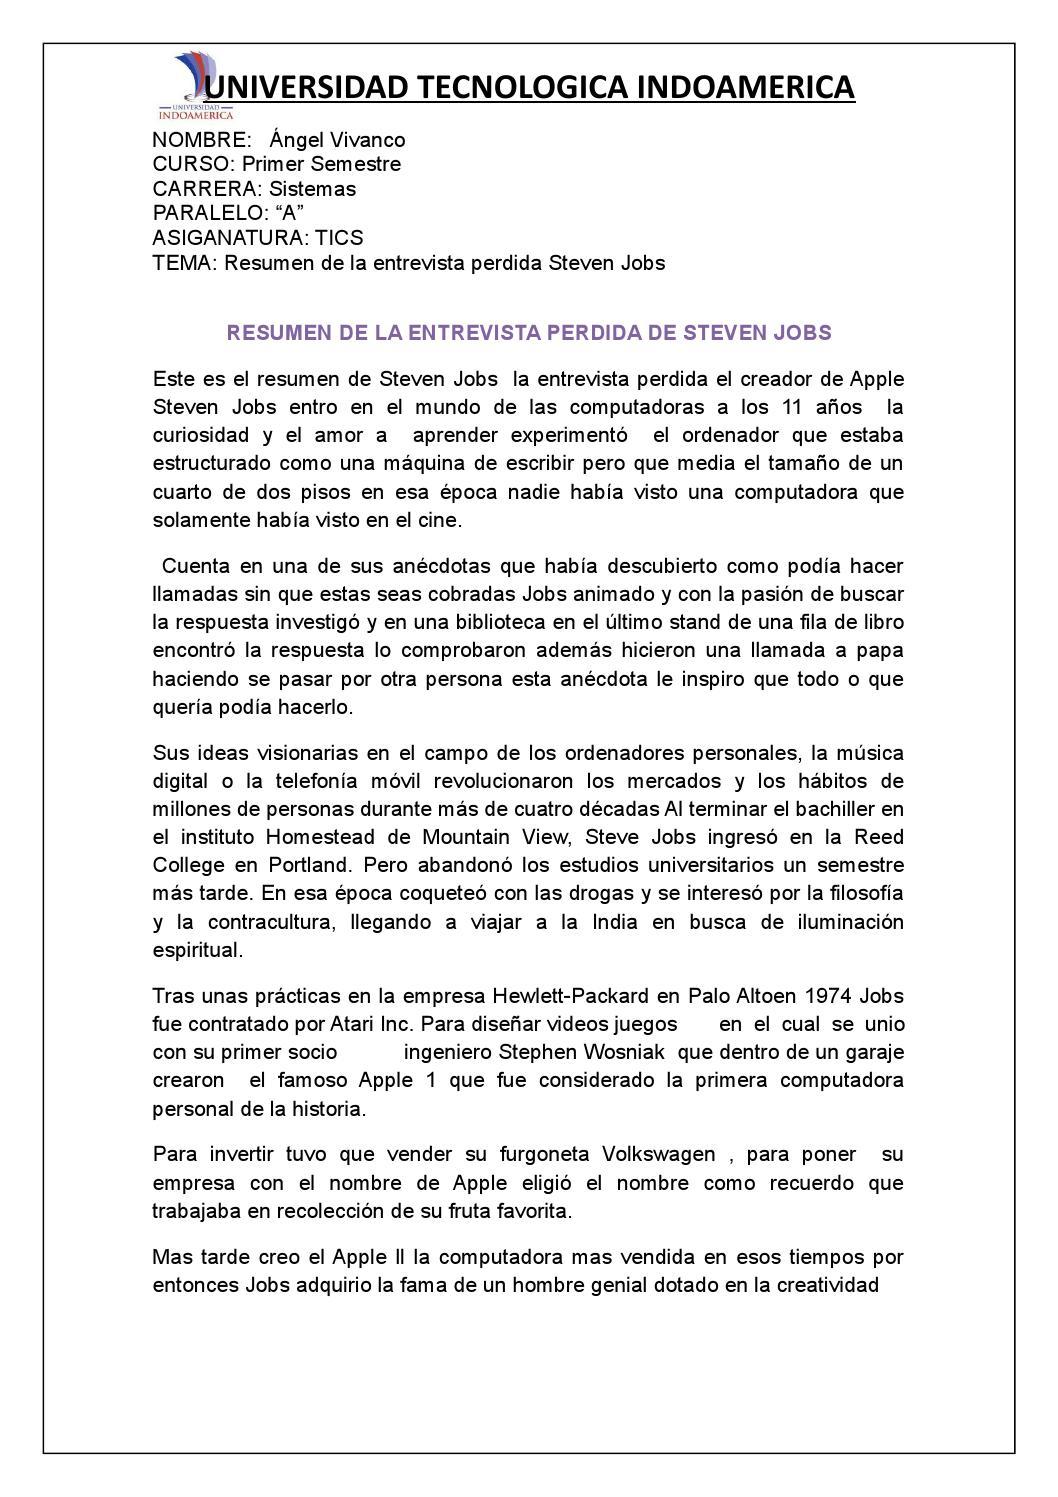 Deber De Tics Entrevista De Steve Jobs By Angel Vivanco Issuu